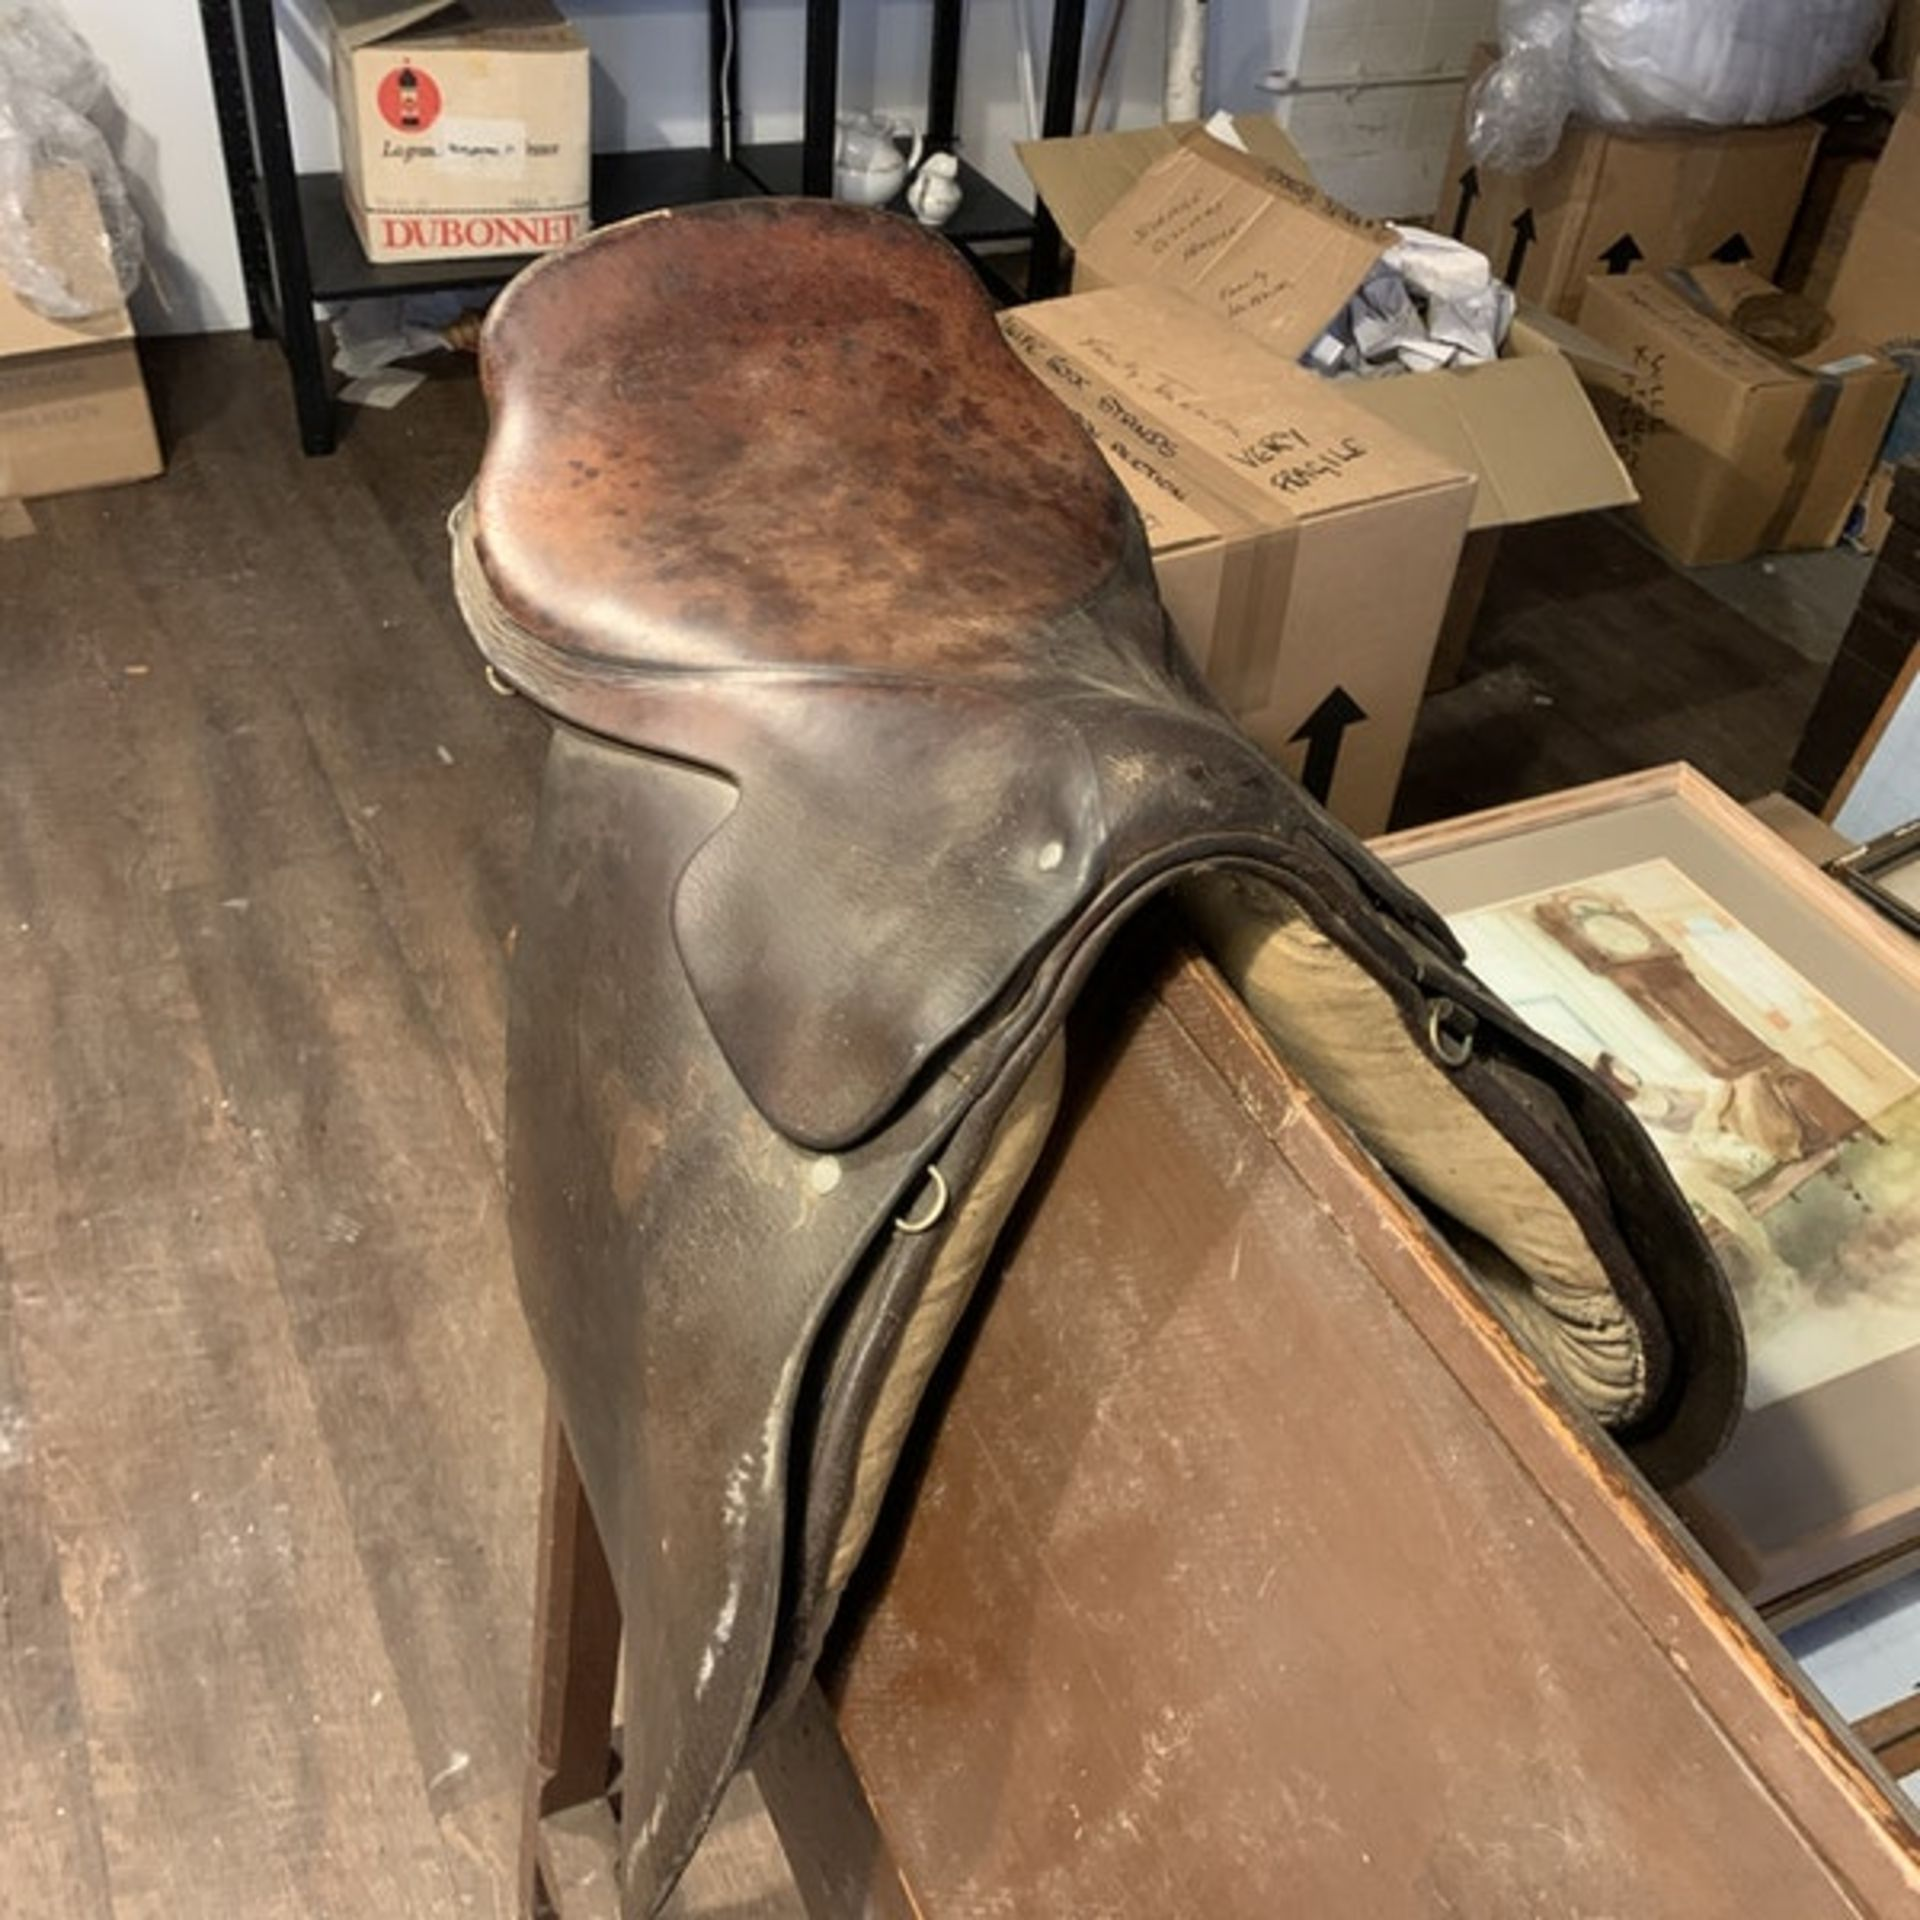 Vintage leather horses saddle. c. Circa 1960 Height 90 cm; Length 48 cm; Depth 45 cm